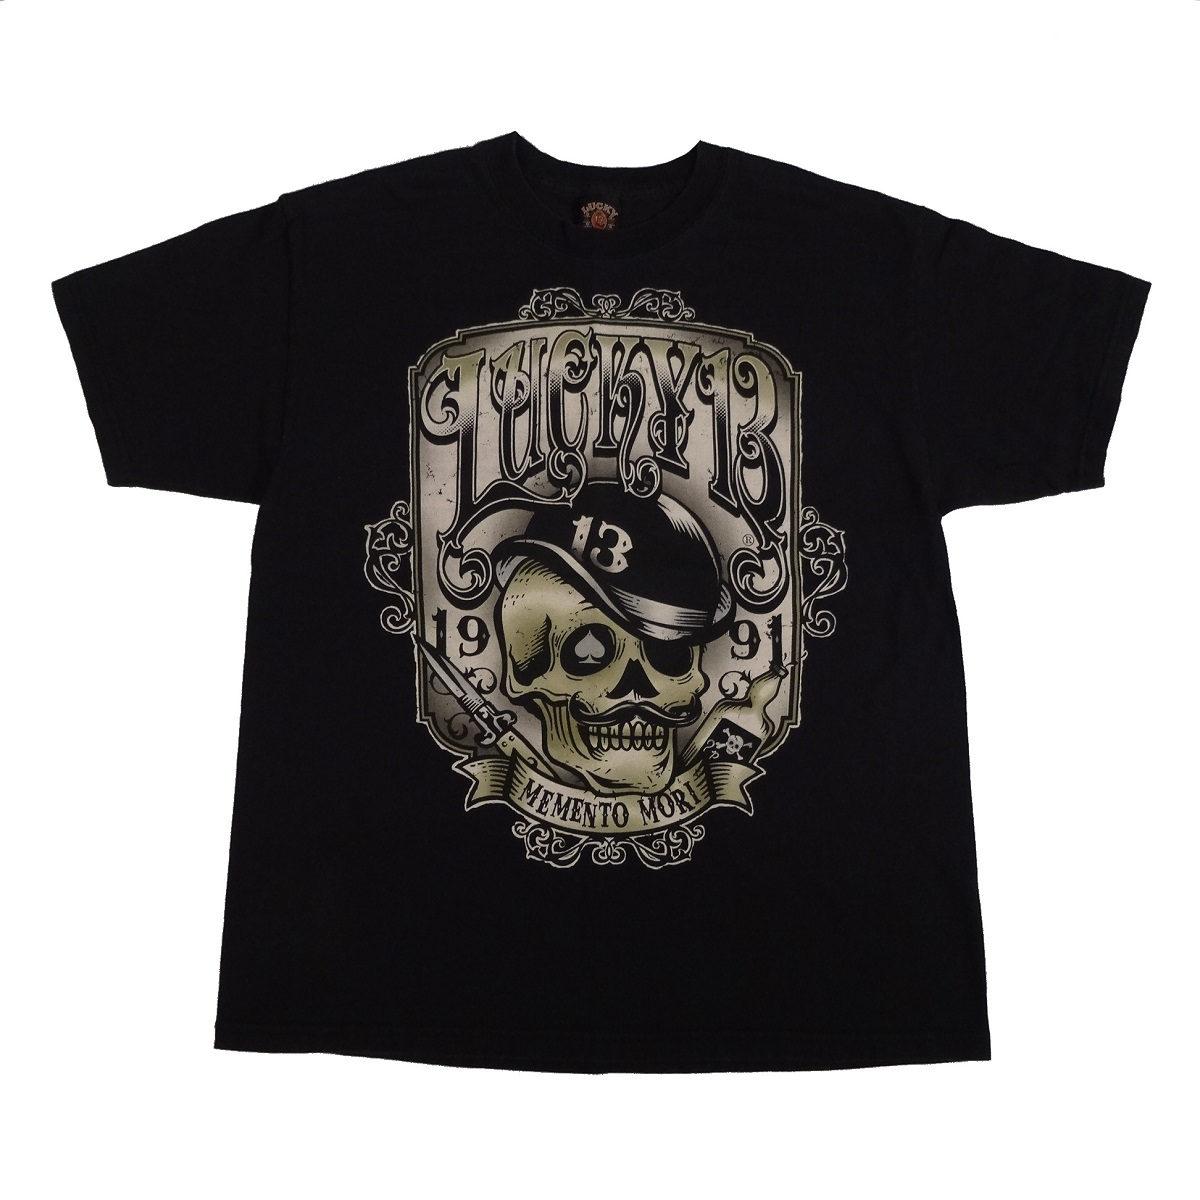 lucky 13 memento mori t shirt front